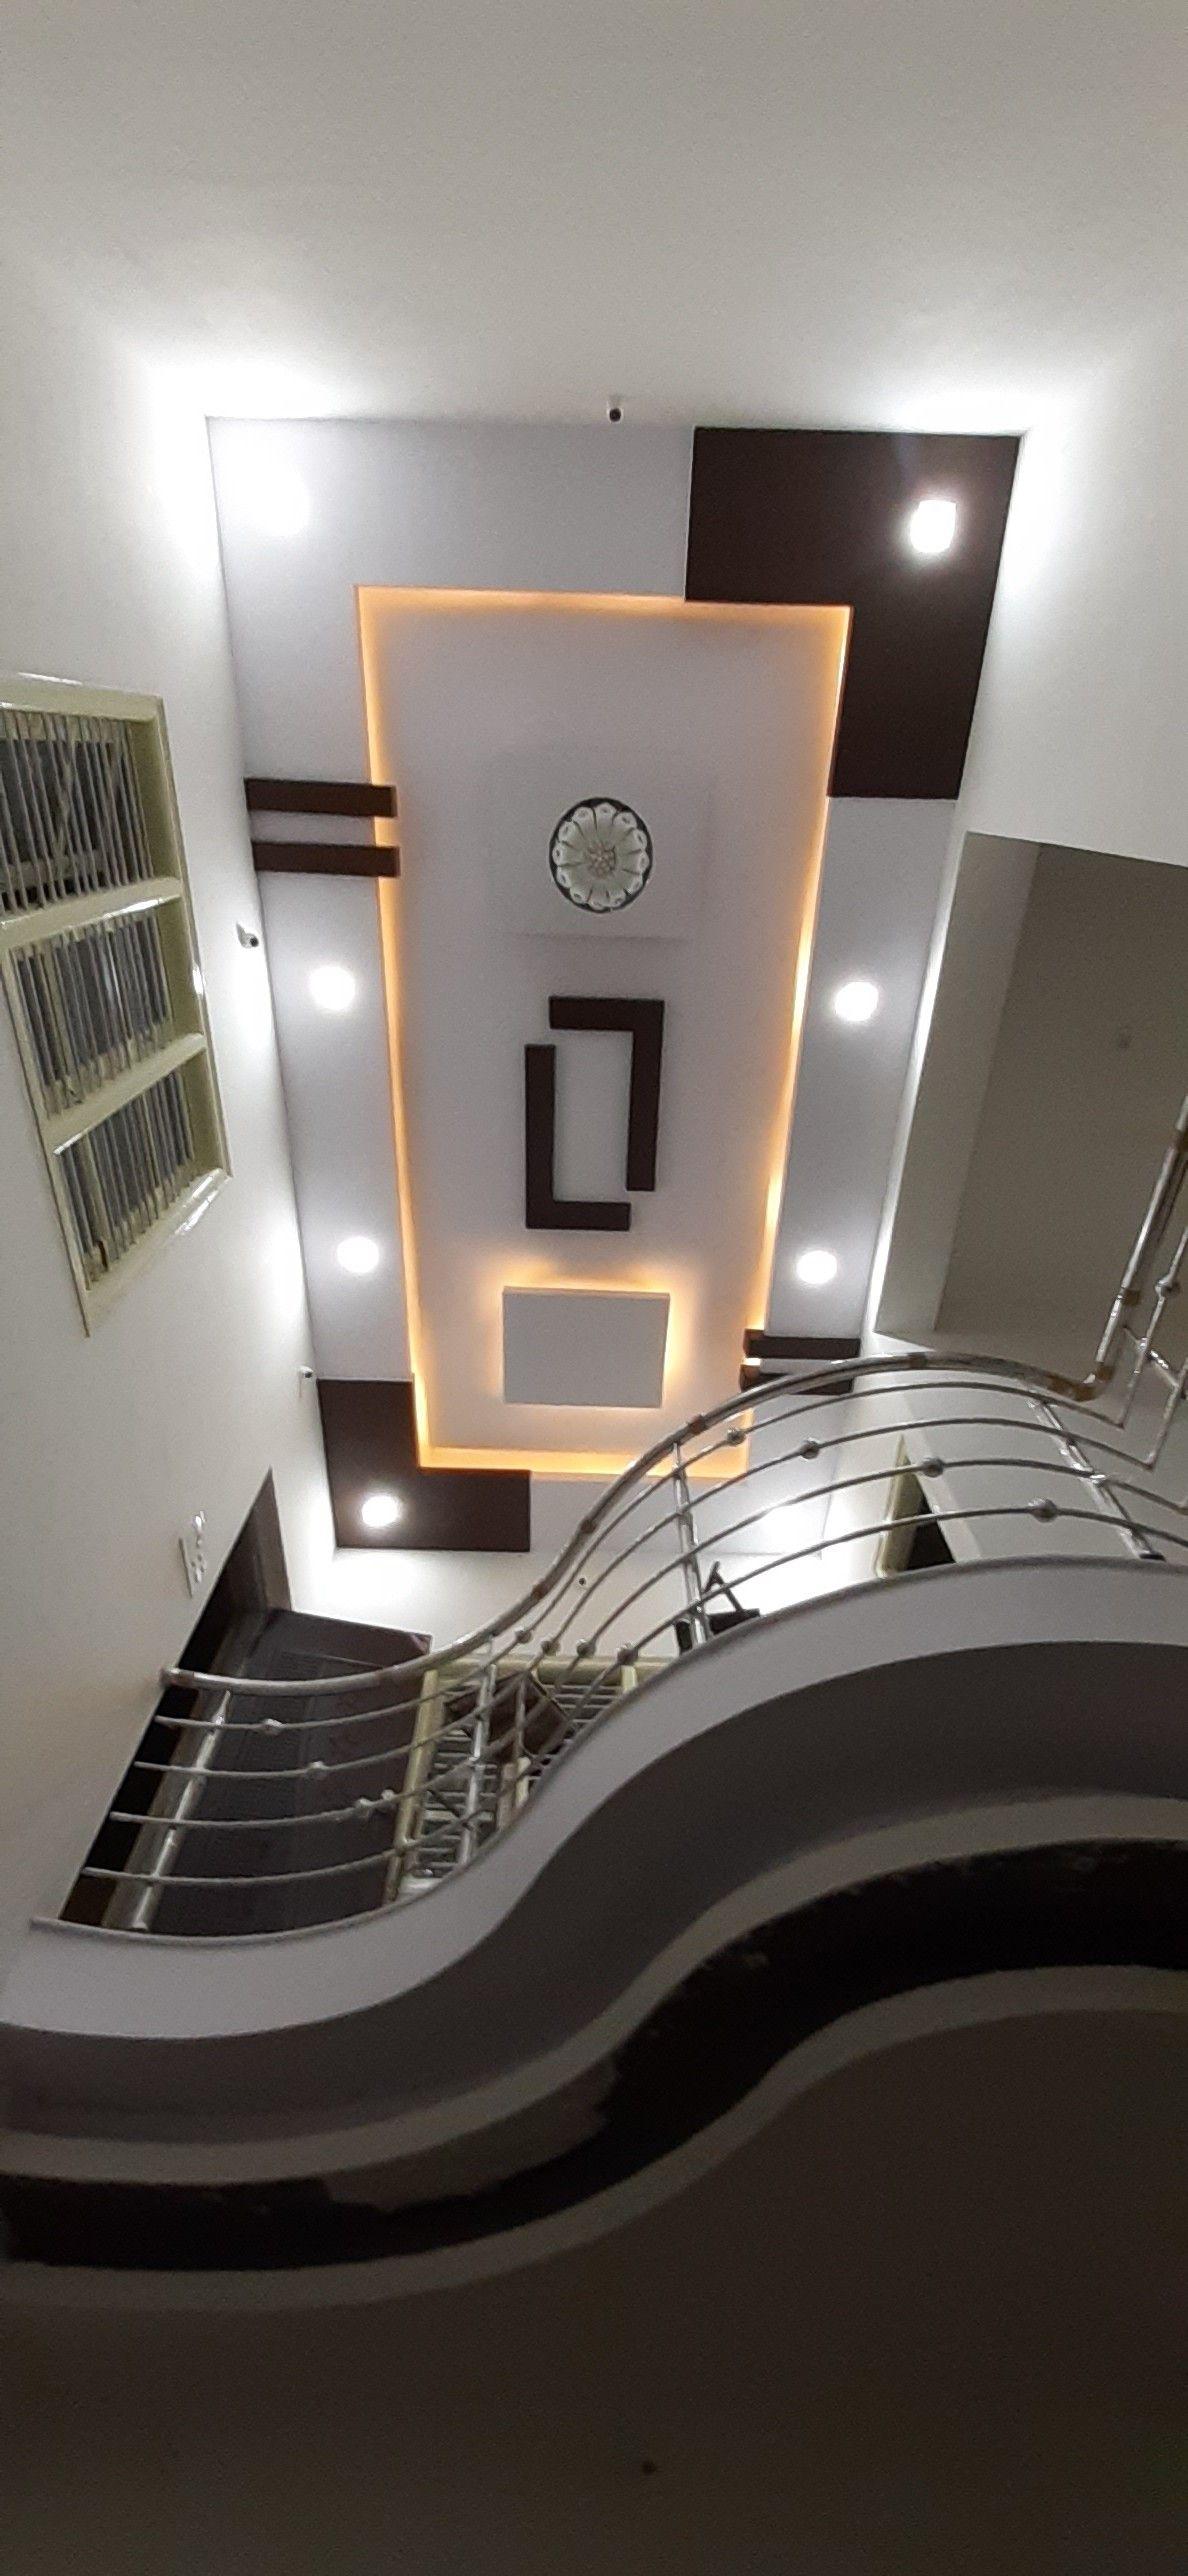 Pin by sivalingappa kuruva on pop design | Ceiling design ...